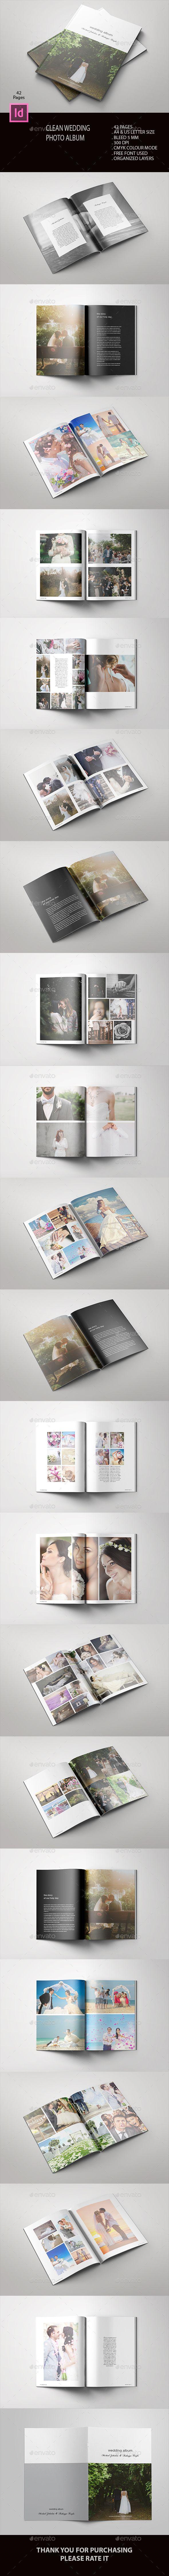 Clean Wedding Album - #Photo #Albums Print Templates